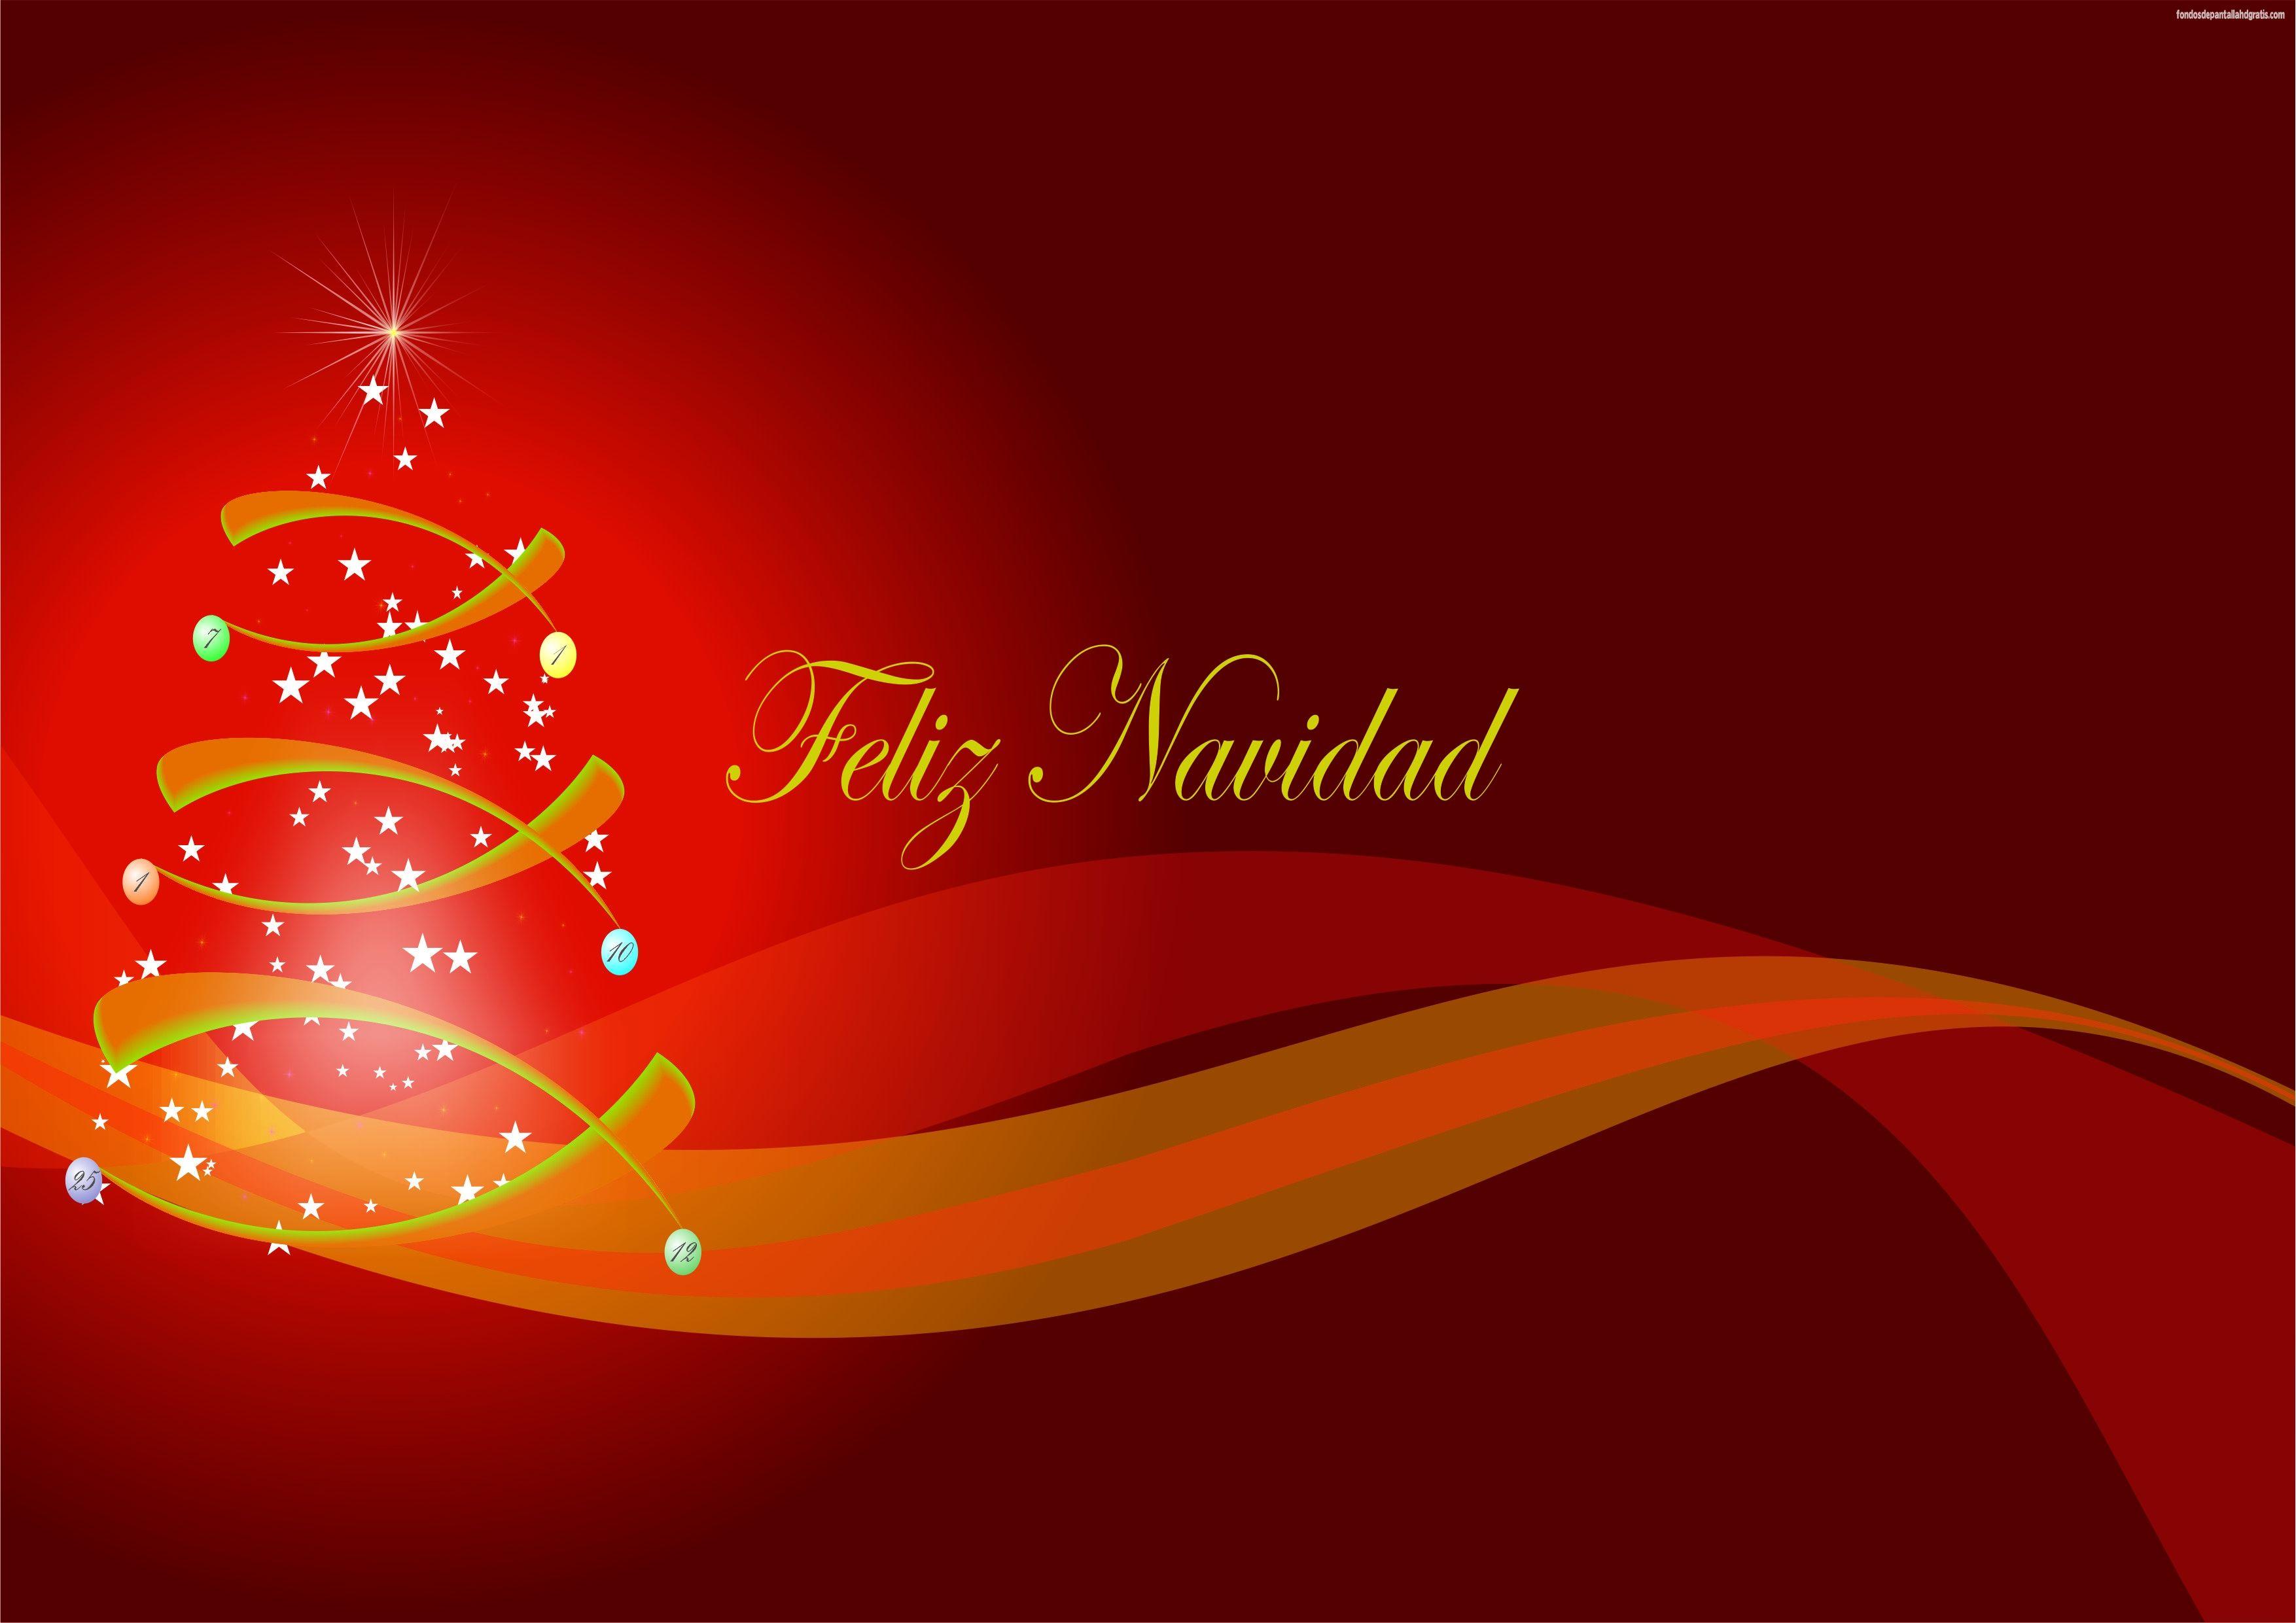 Fondos De Pantalla Navidenos Gratis: Fondos De Navidad Gratis En Hd Gratis 12